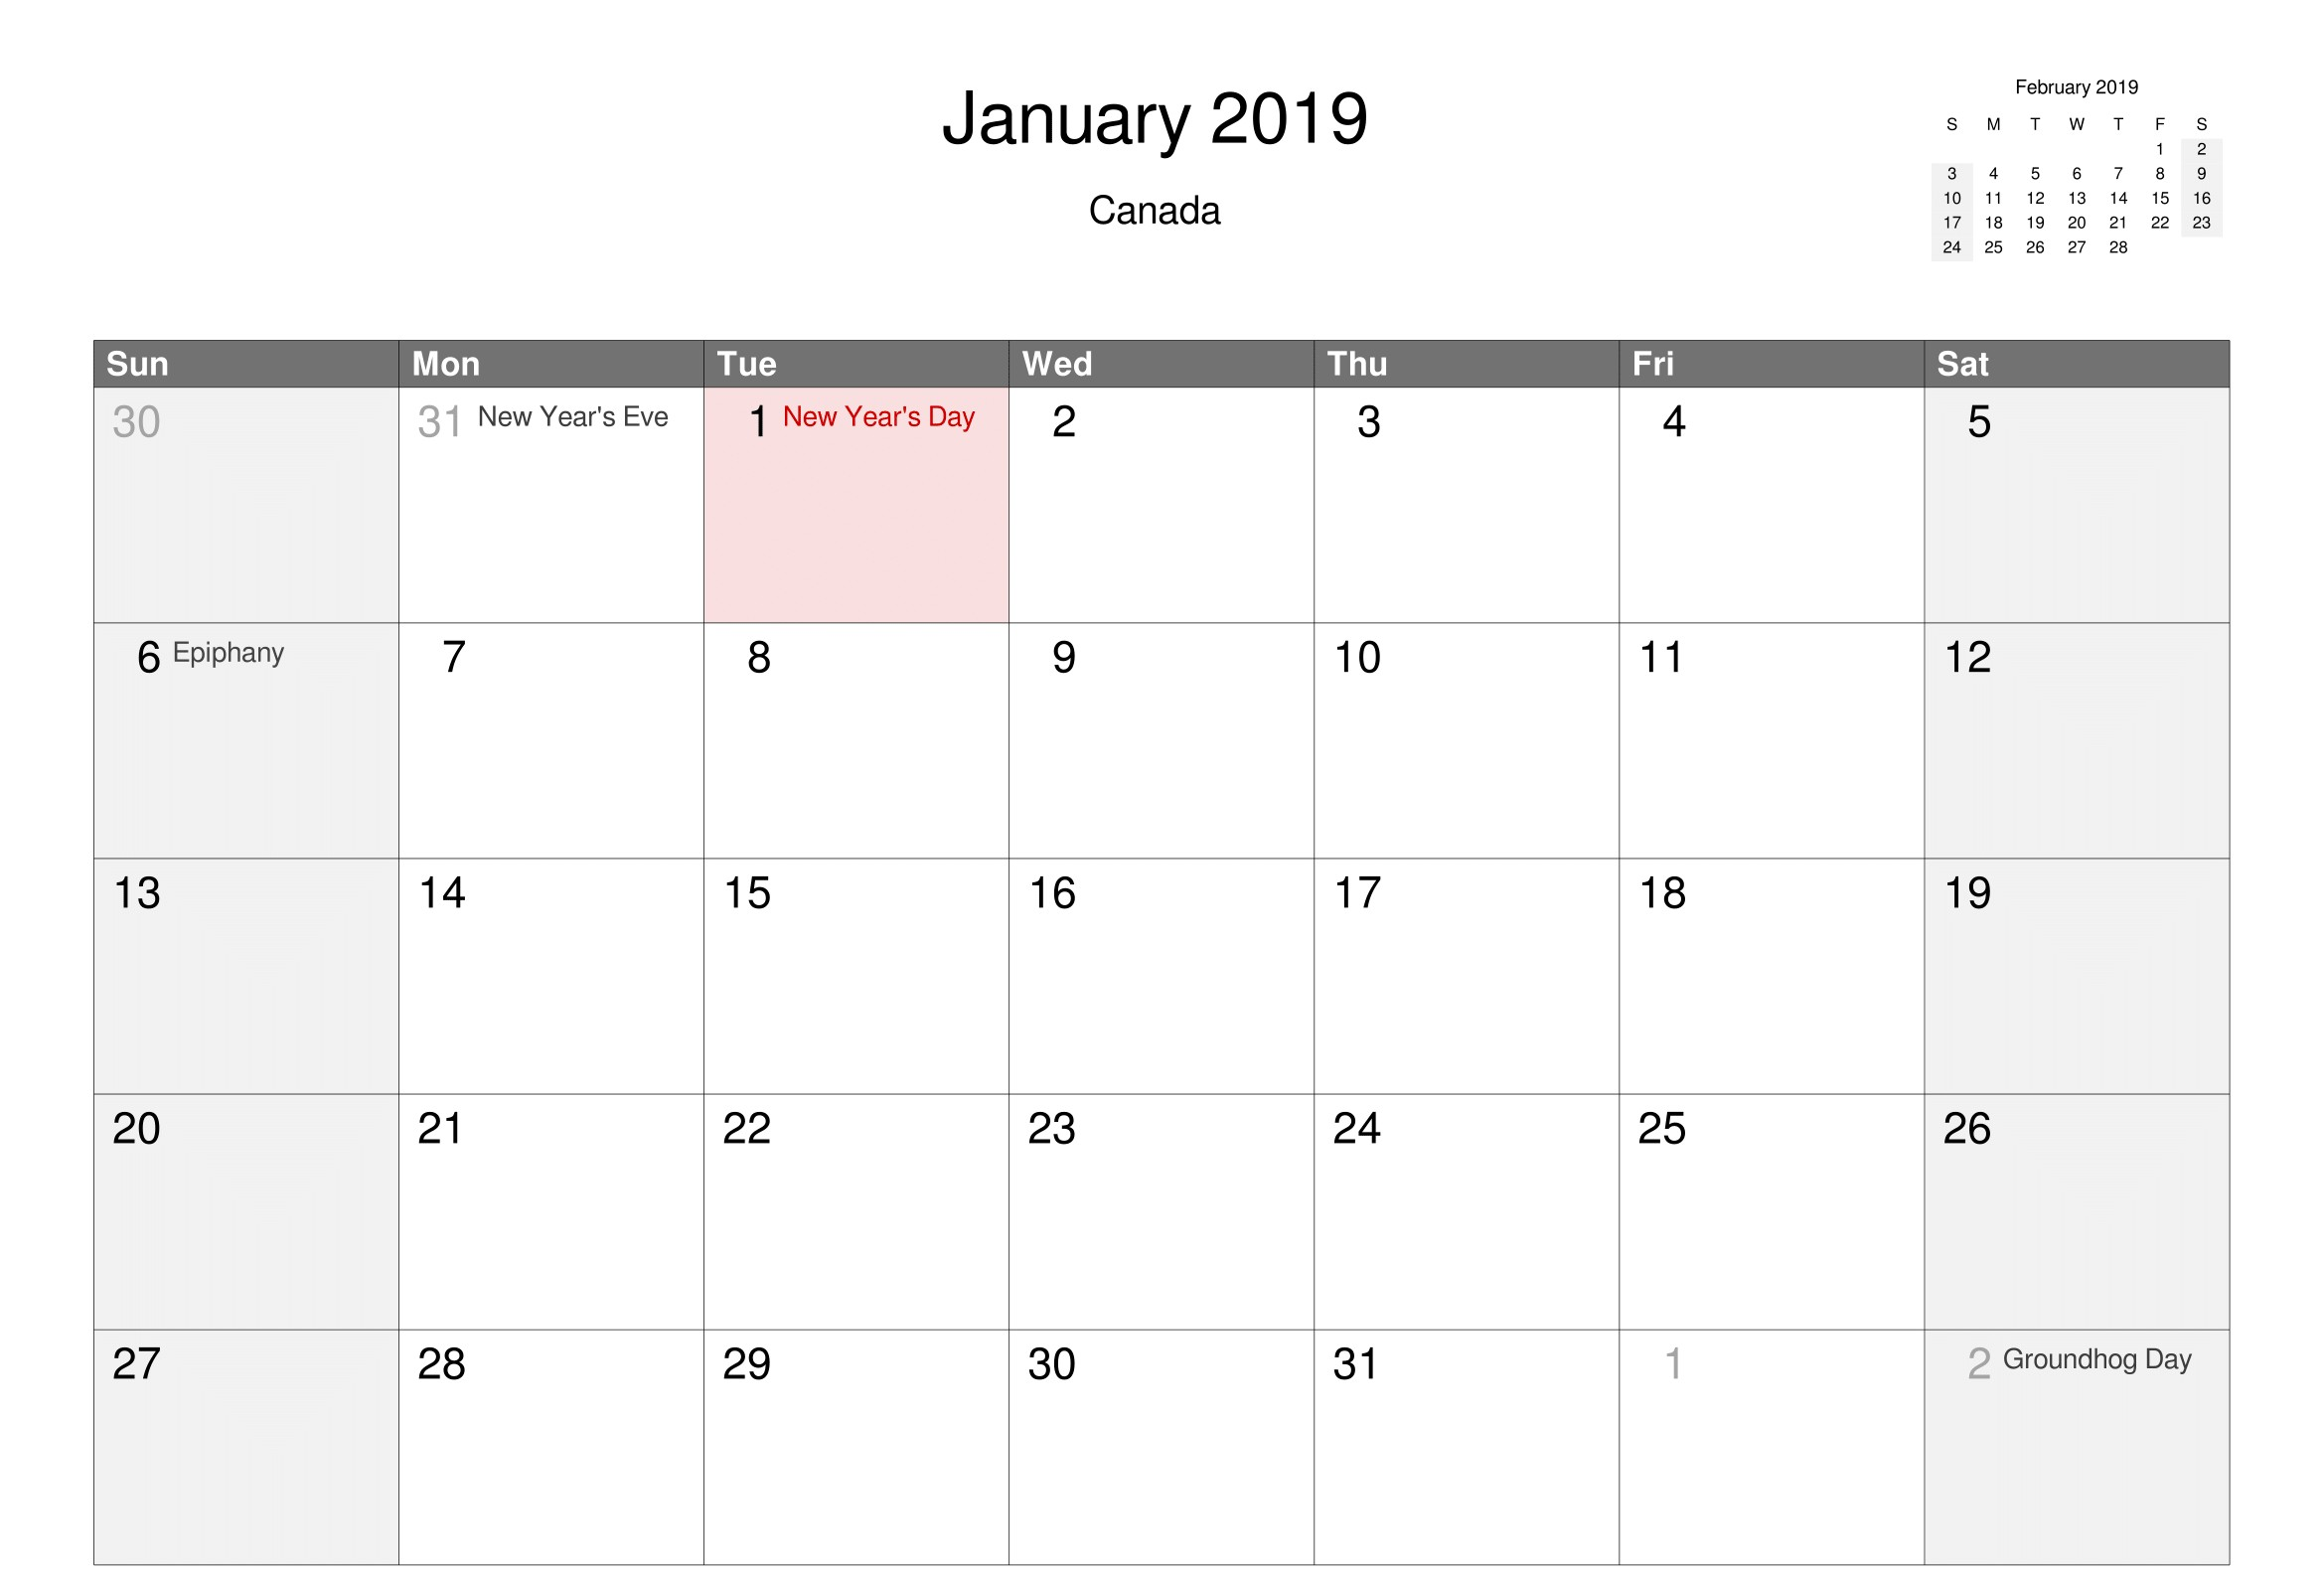 March Calendar Canada Recientes January 2019 Calendars Canada Lara Expolicenciaslatam Of March Calendar Canada Más Recientes Flowers March 2019 Desktop Calendar March March2019